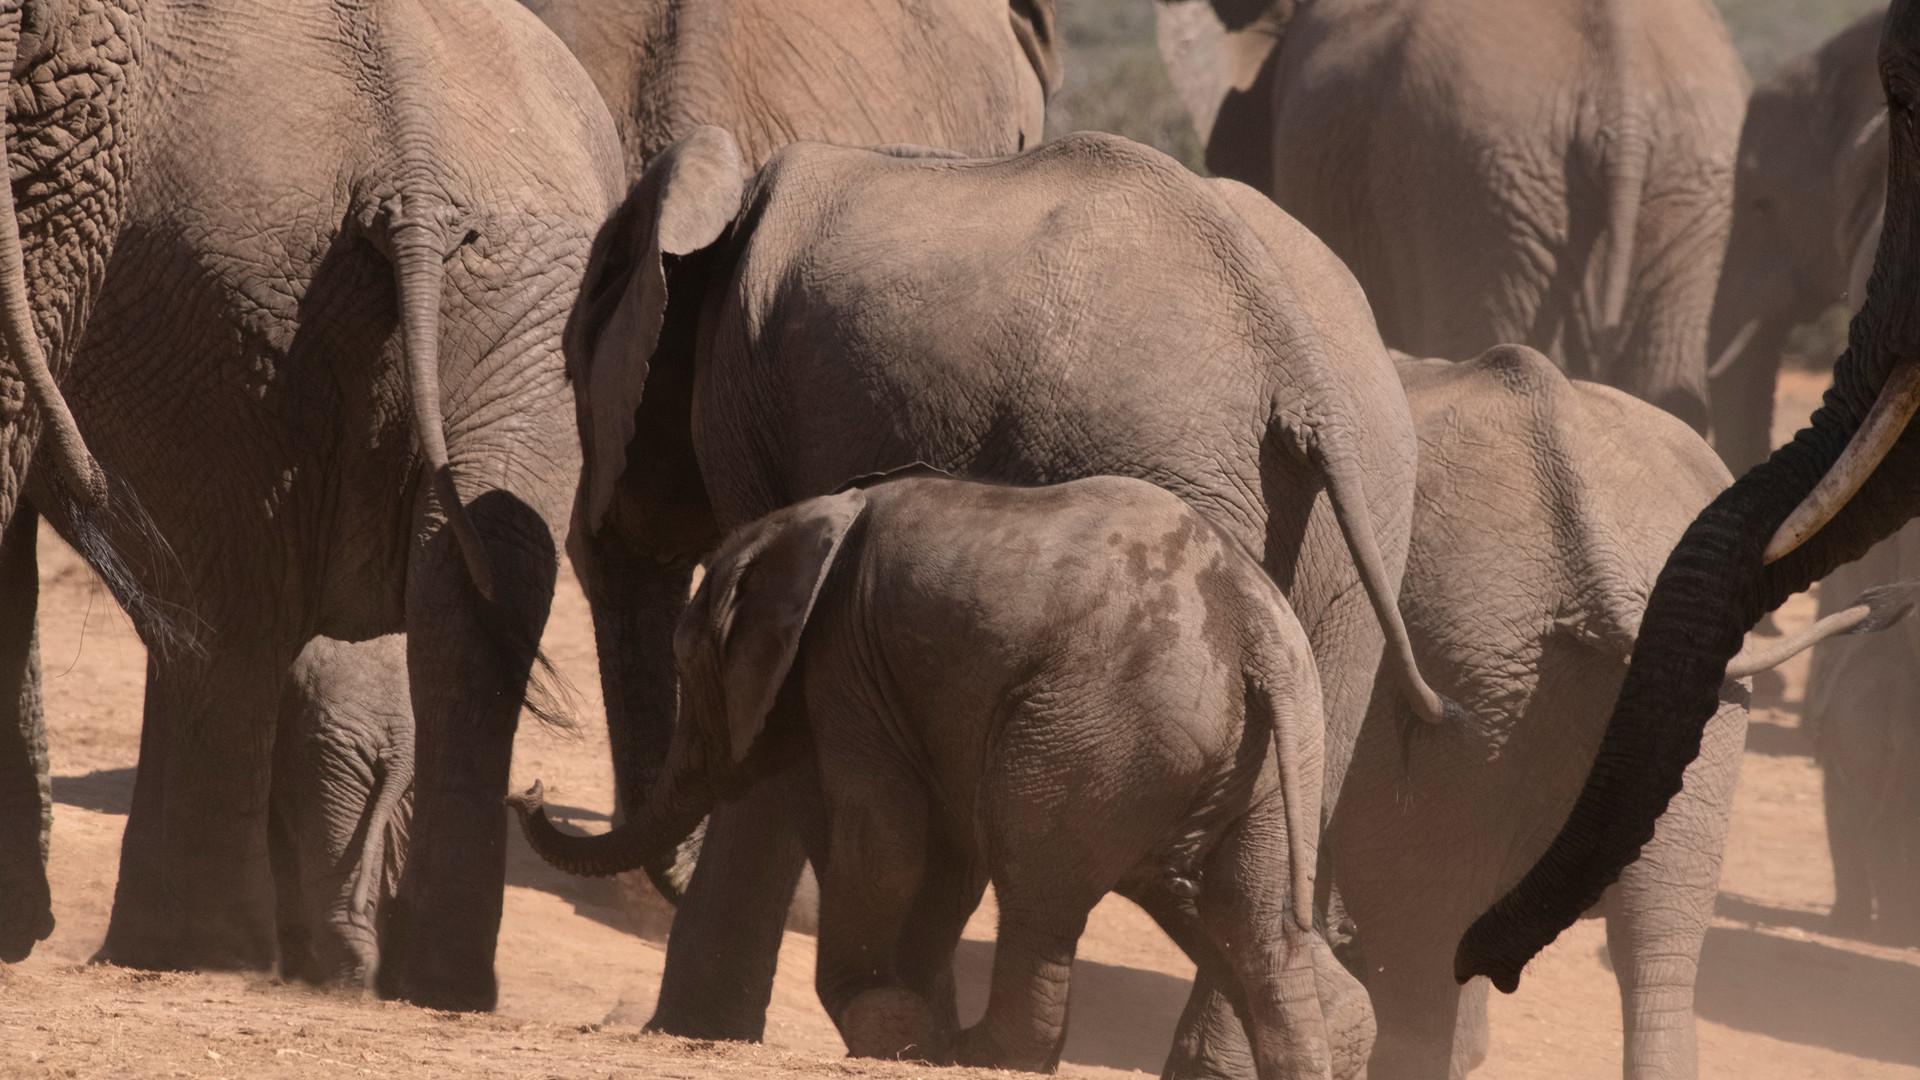 a elephant_DSC_1271.jpg